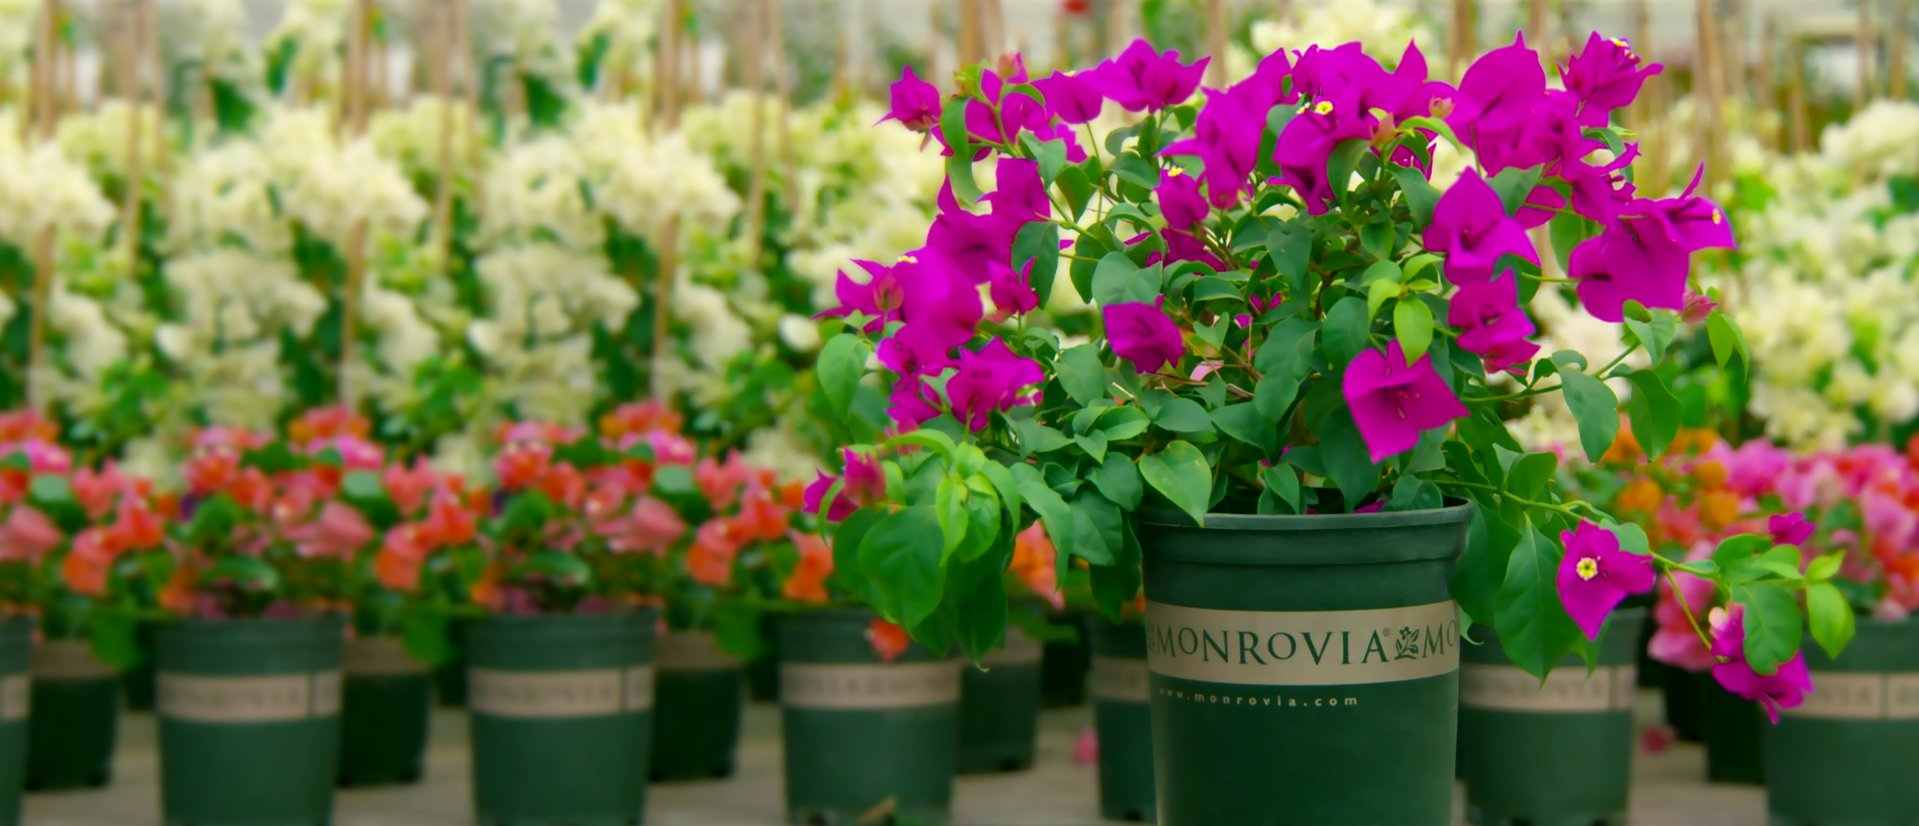 Order monrovia plants online for Buy plans online